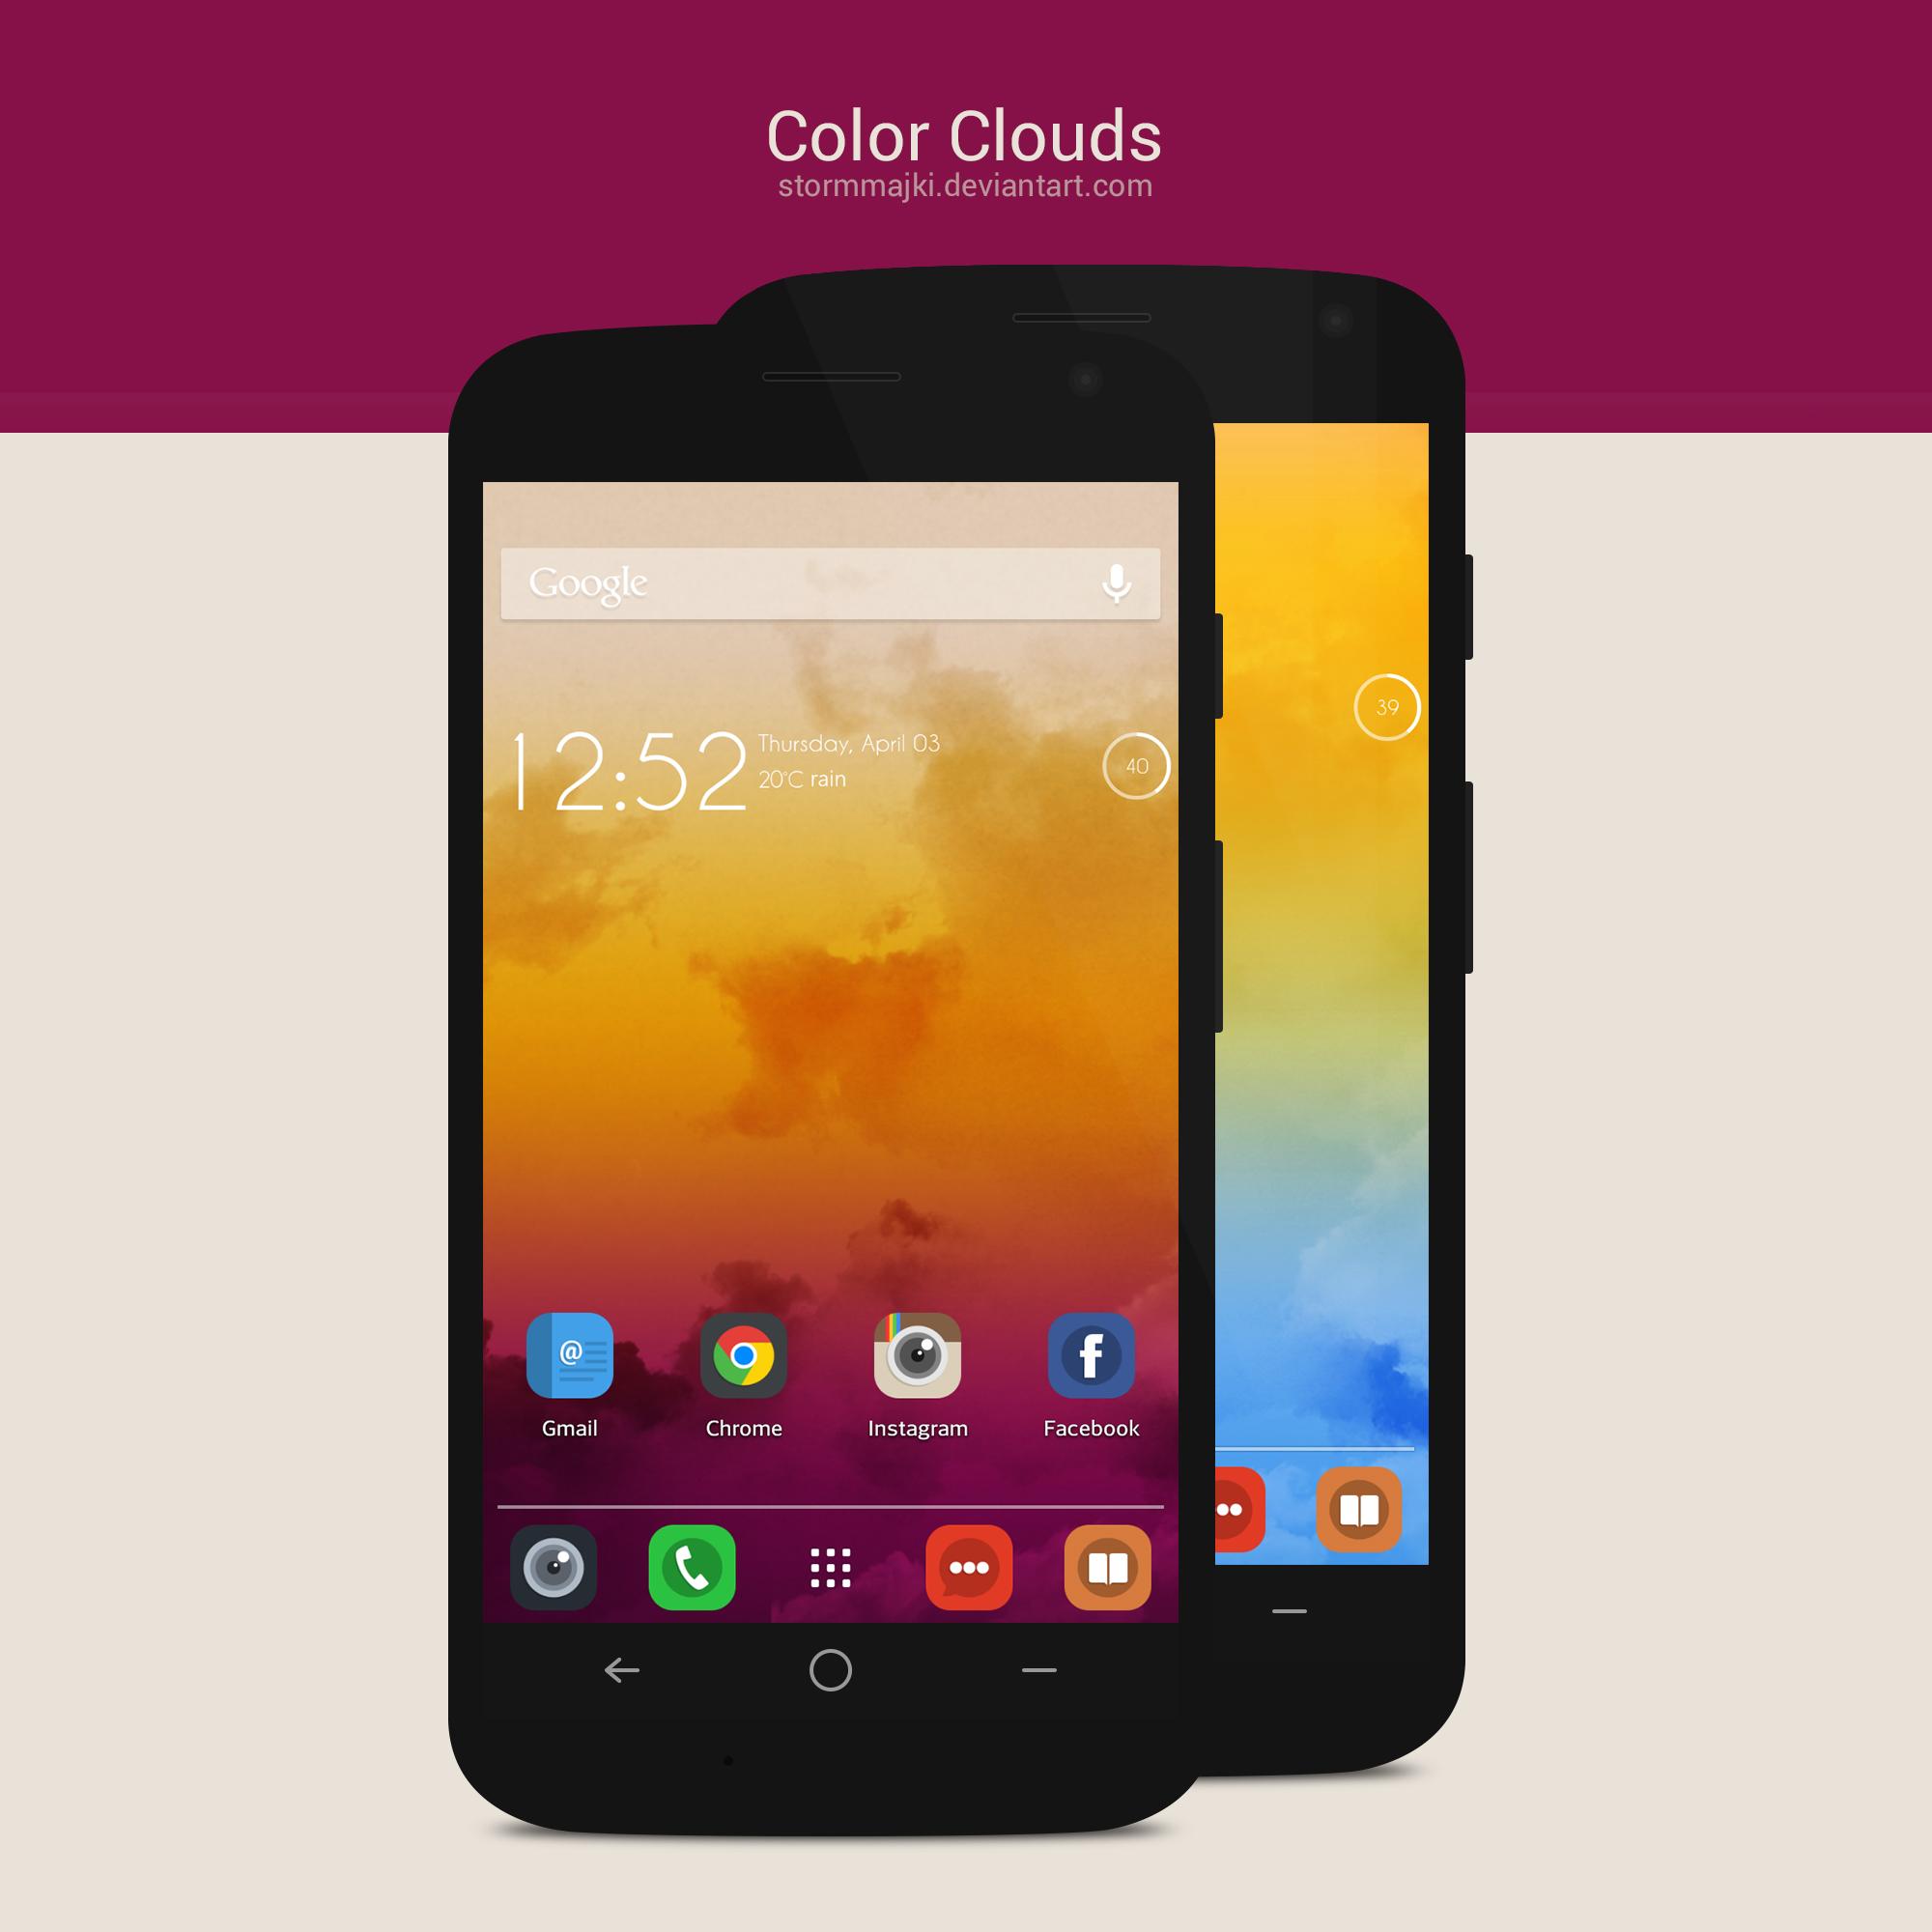 Color Clouds Wallpaper